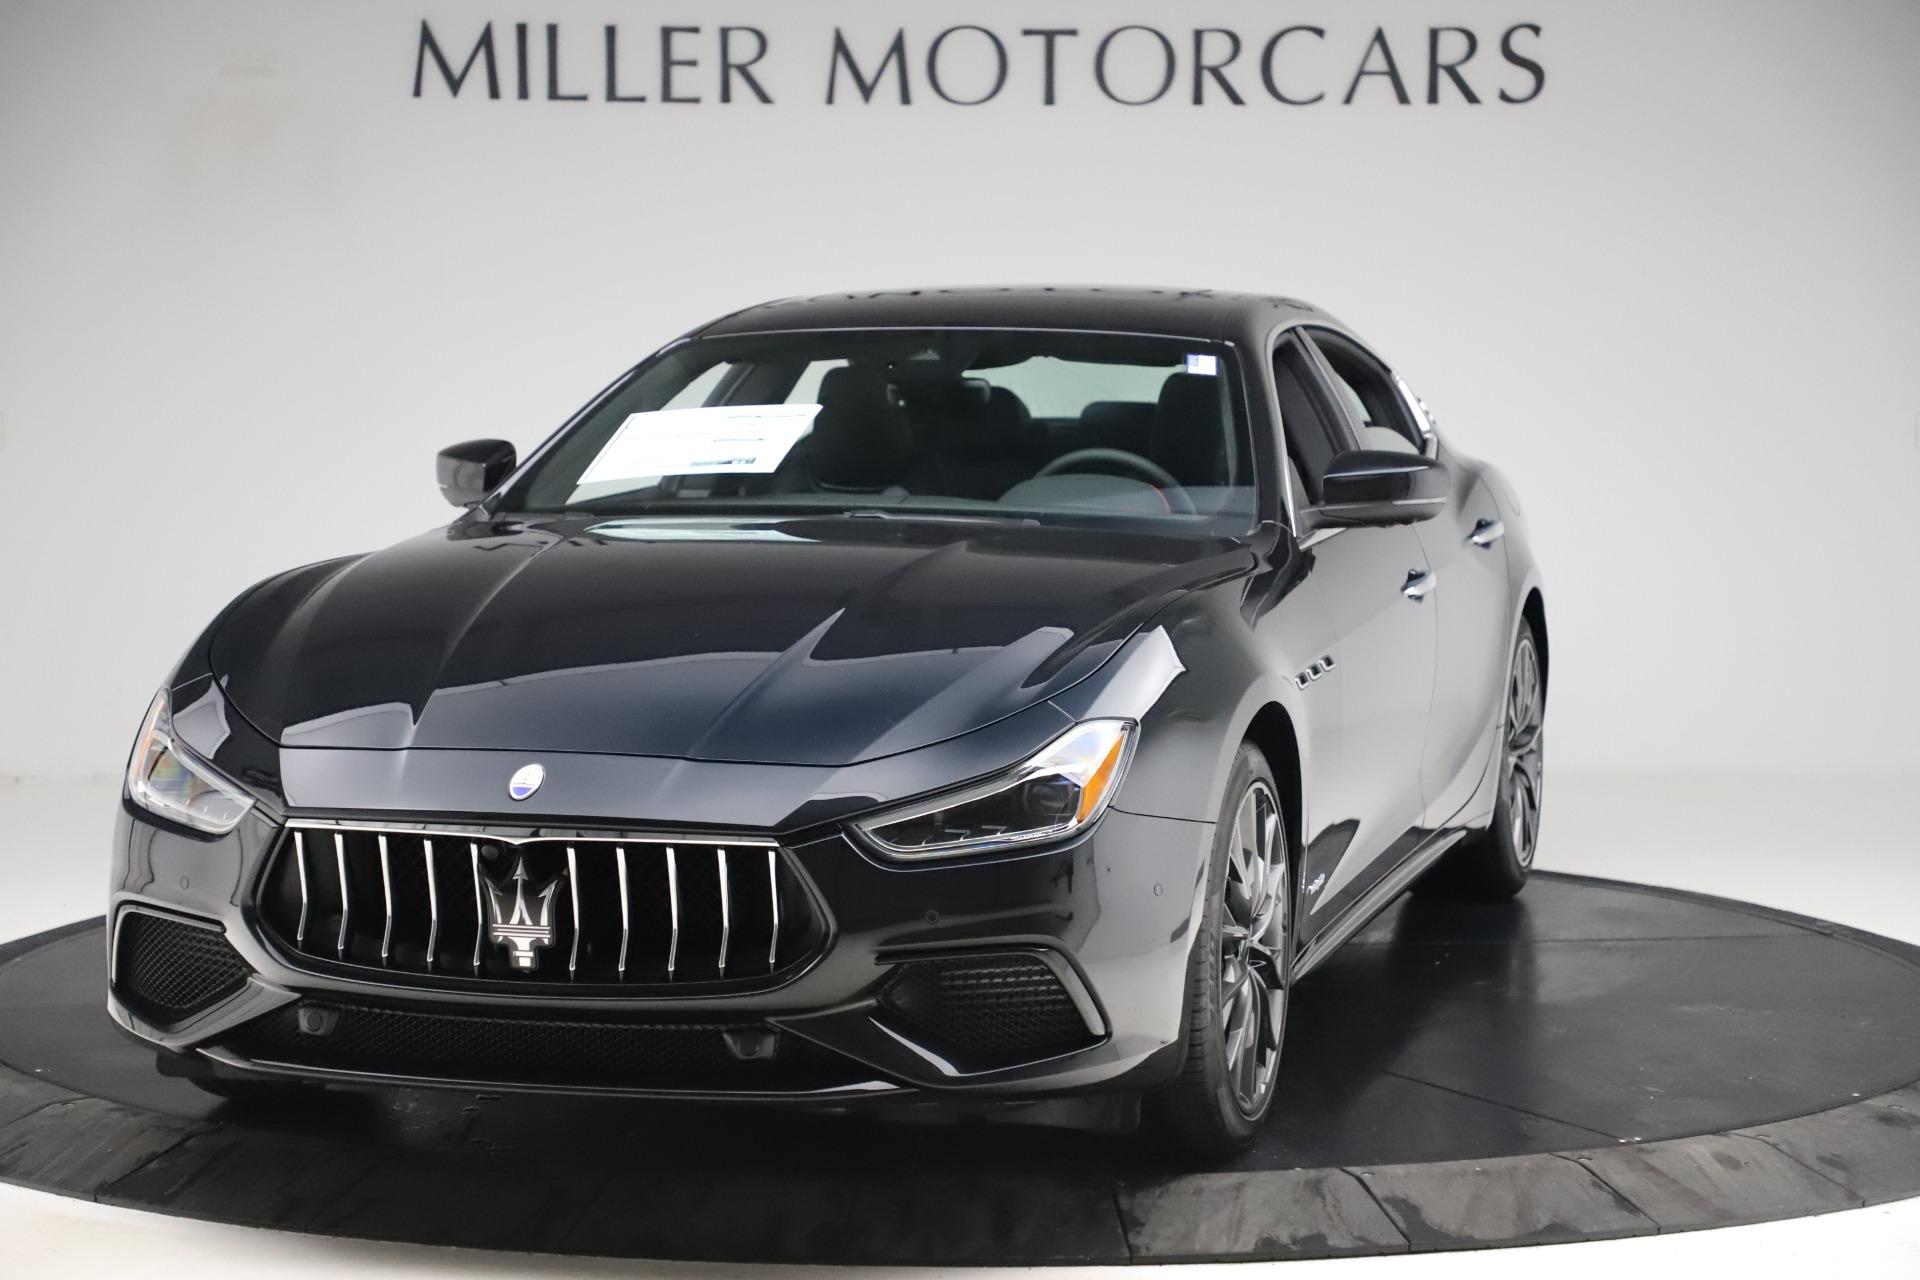 New 2019 Maserati Ghibli S Q4 GranSport for sale Sold at Maserati of Greenwich in Greenwich CT 06830 1